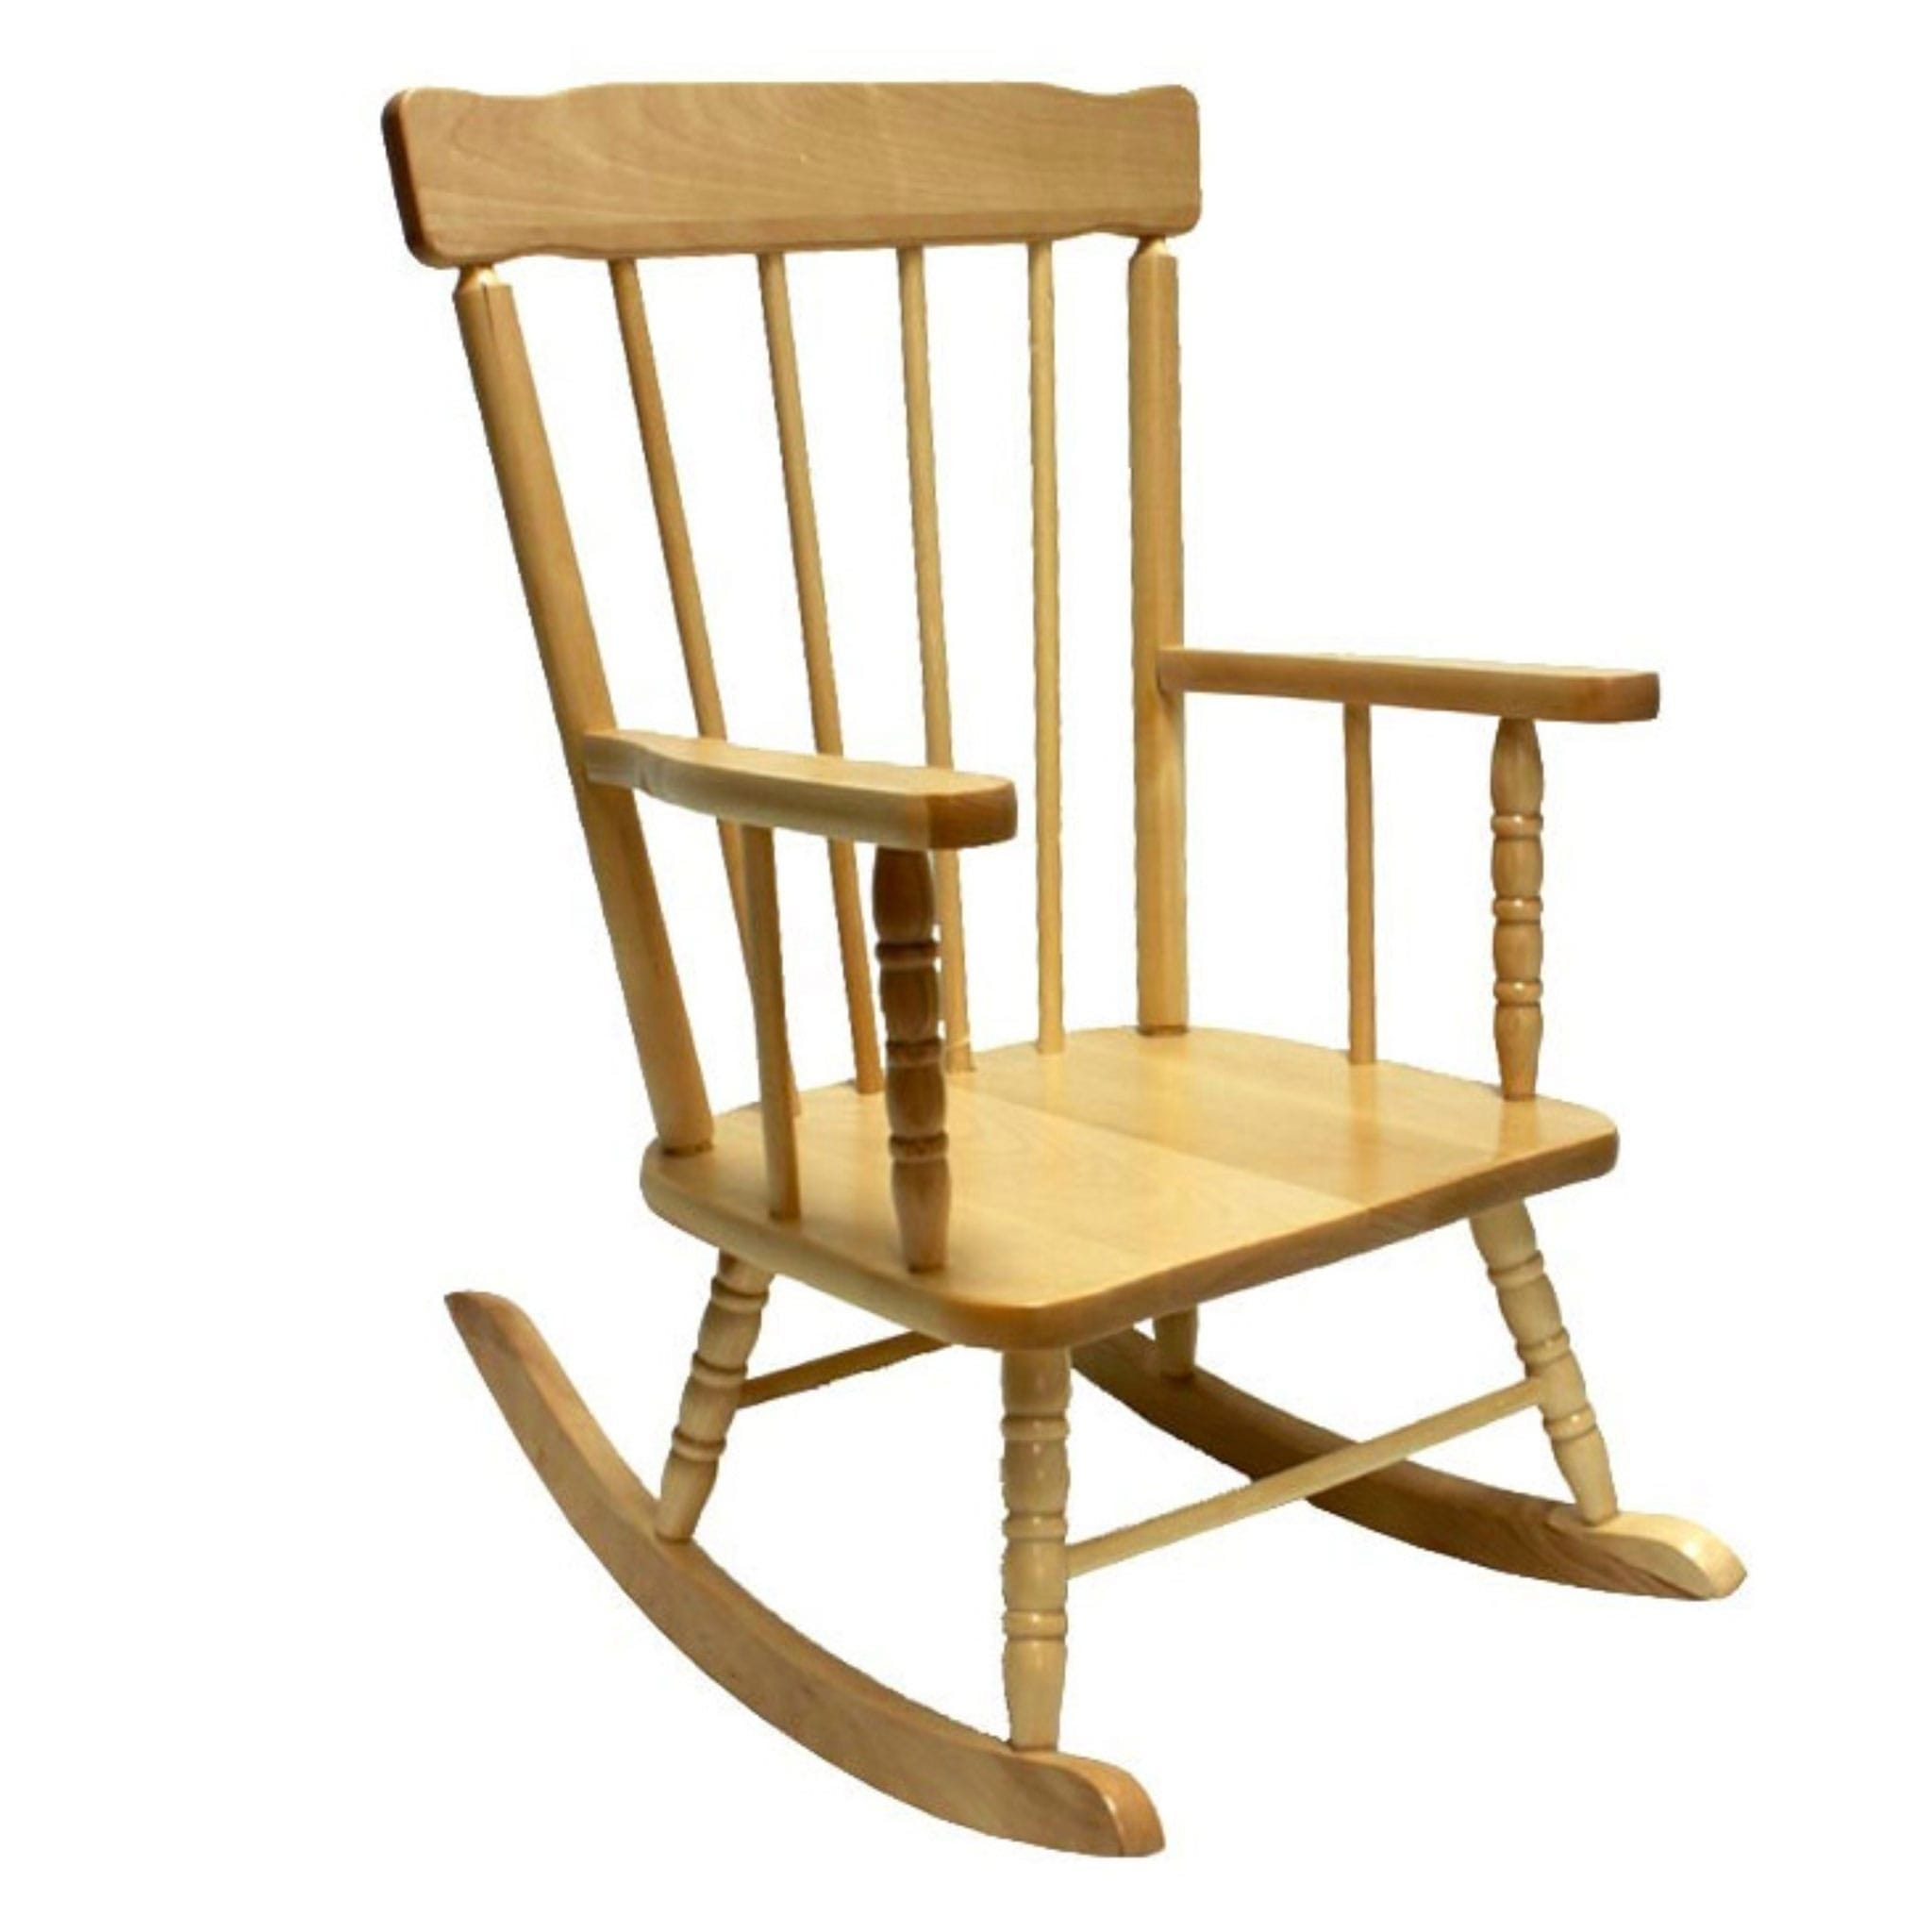 JB Poitras Rocking Chair For Children Clement